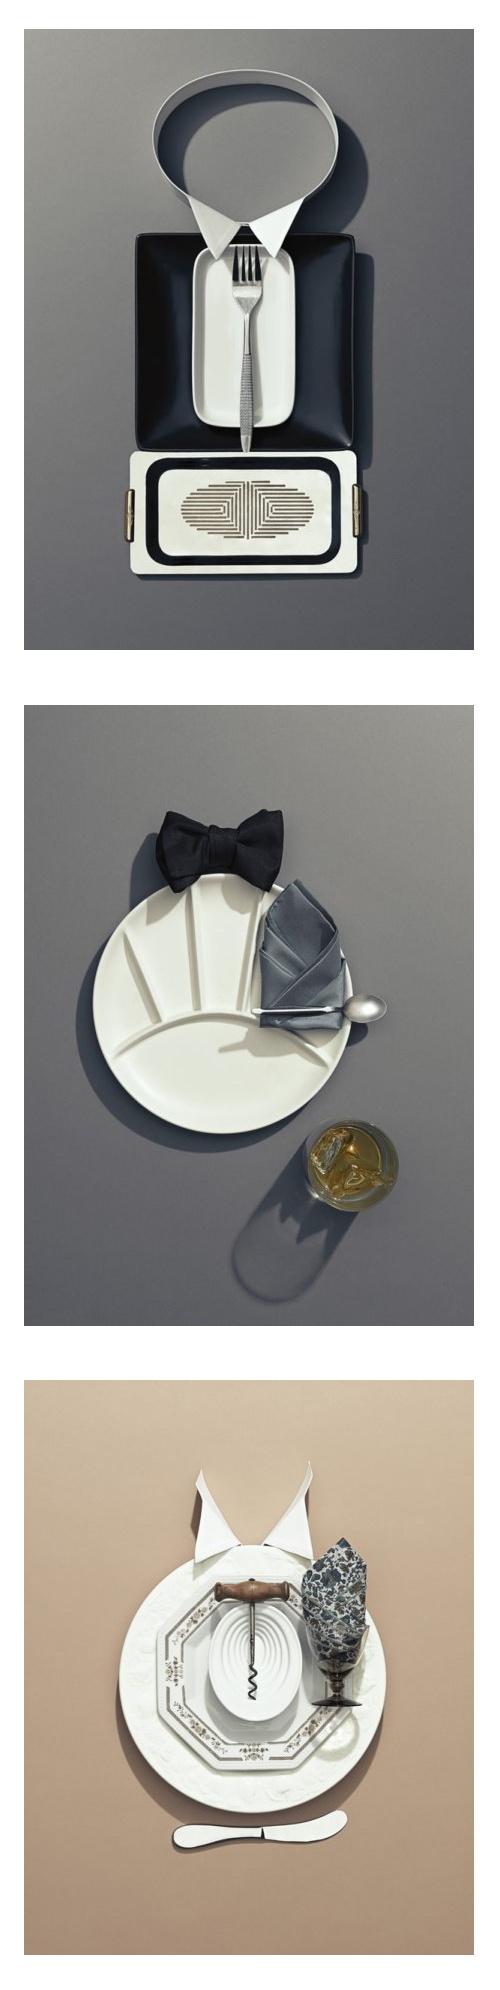 Dressing up the formal dinner